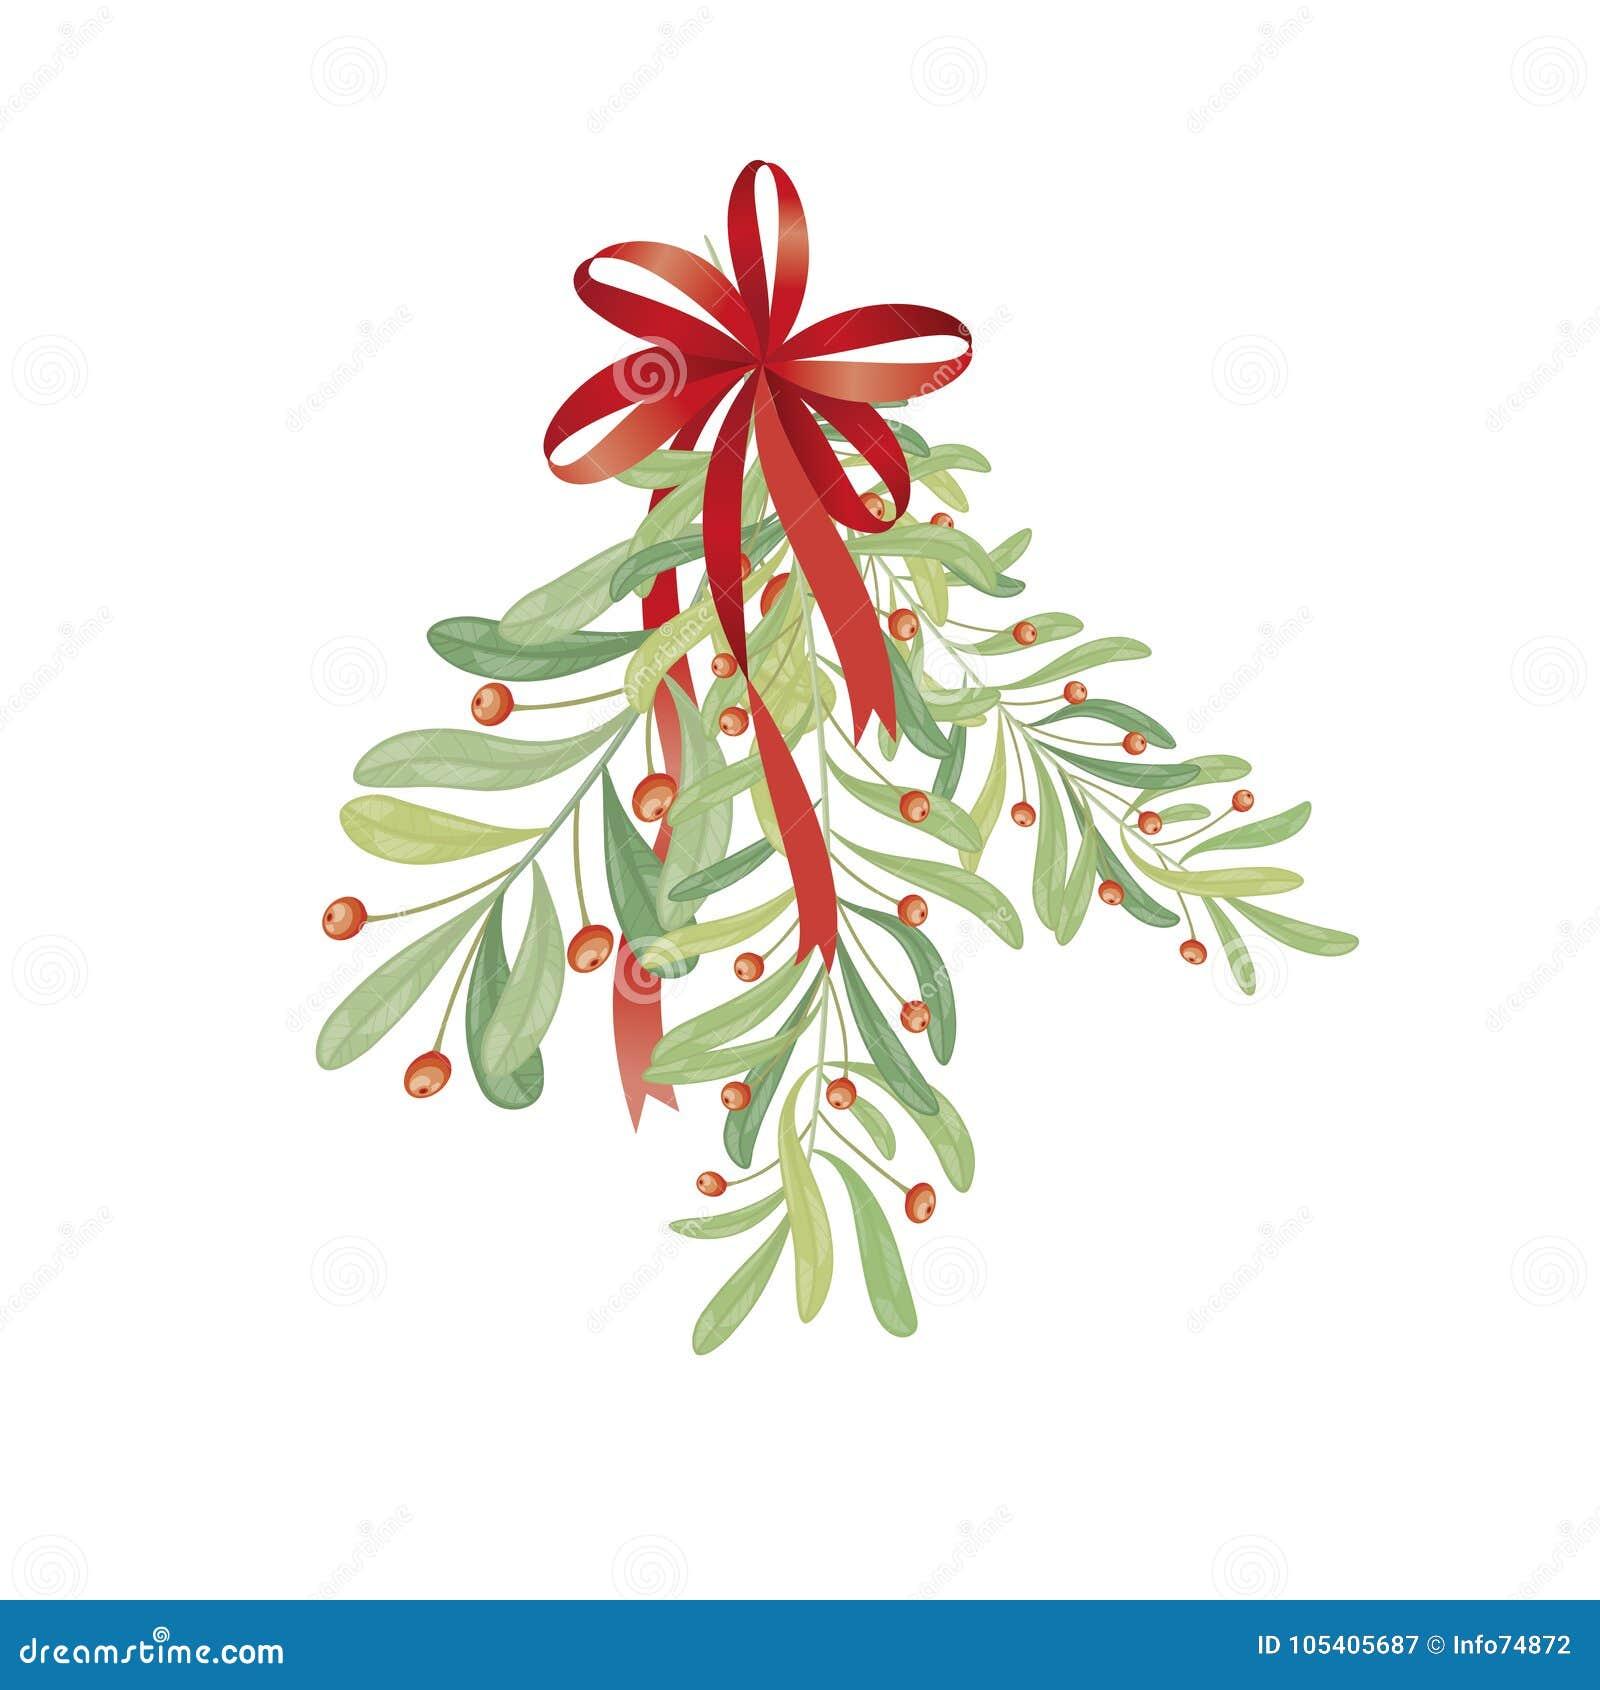 Christmas Sprig Of Mistletoe. Illustration For Greeting Cards, I ...